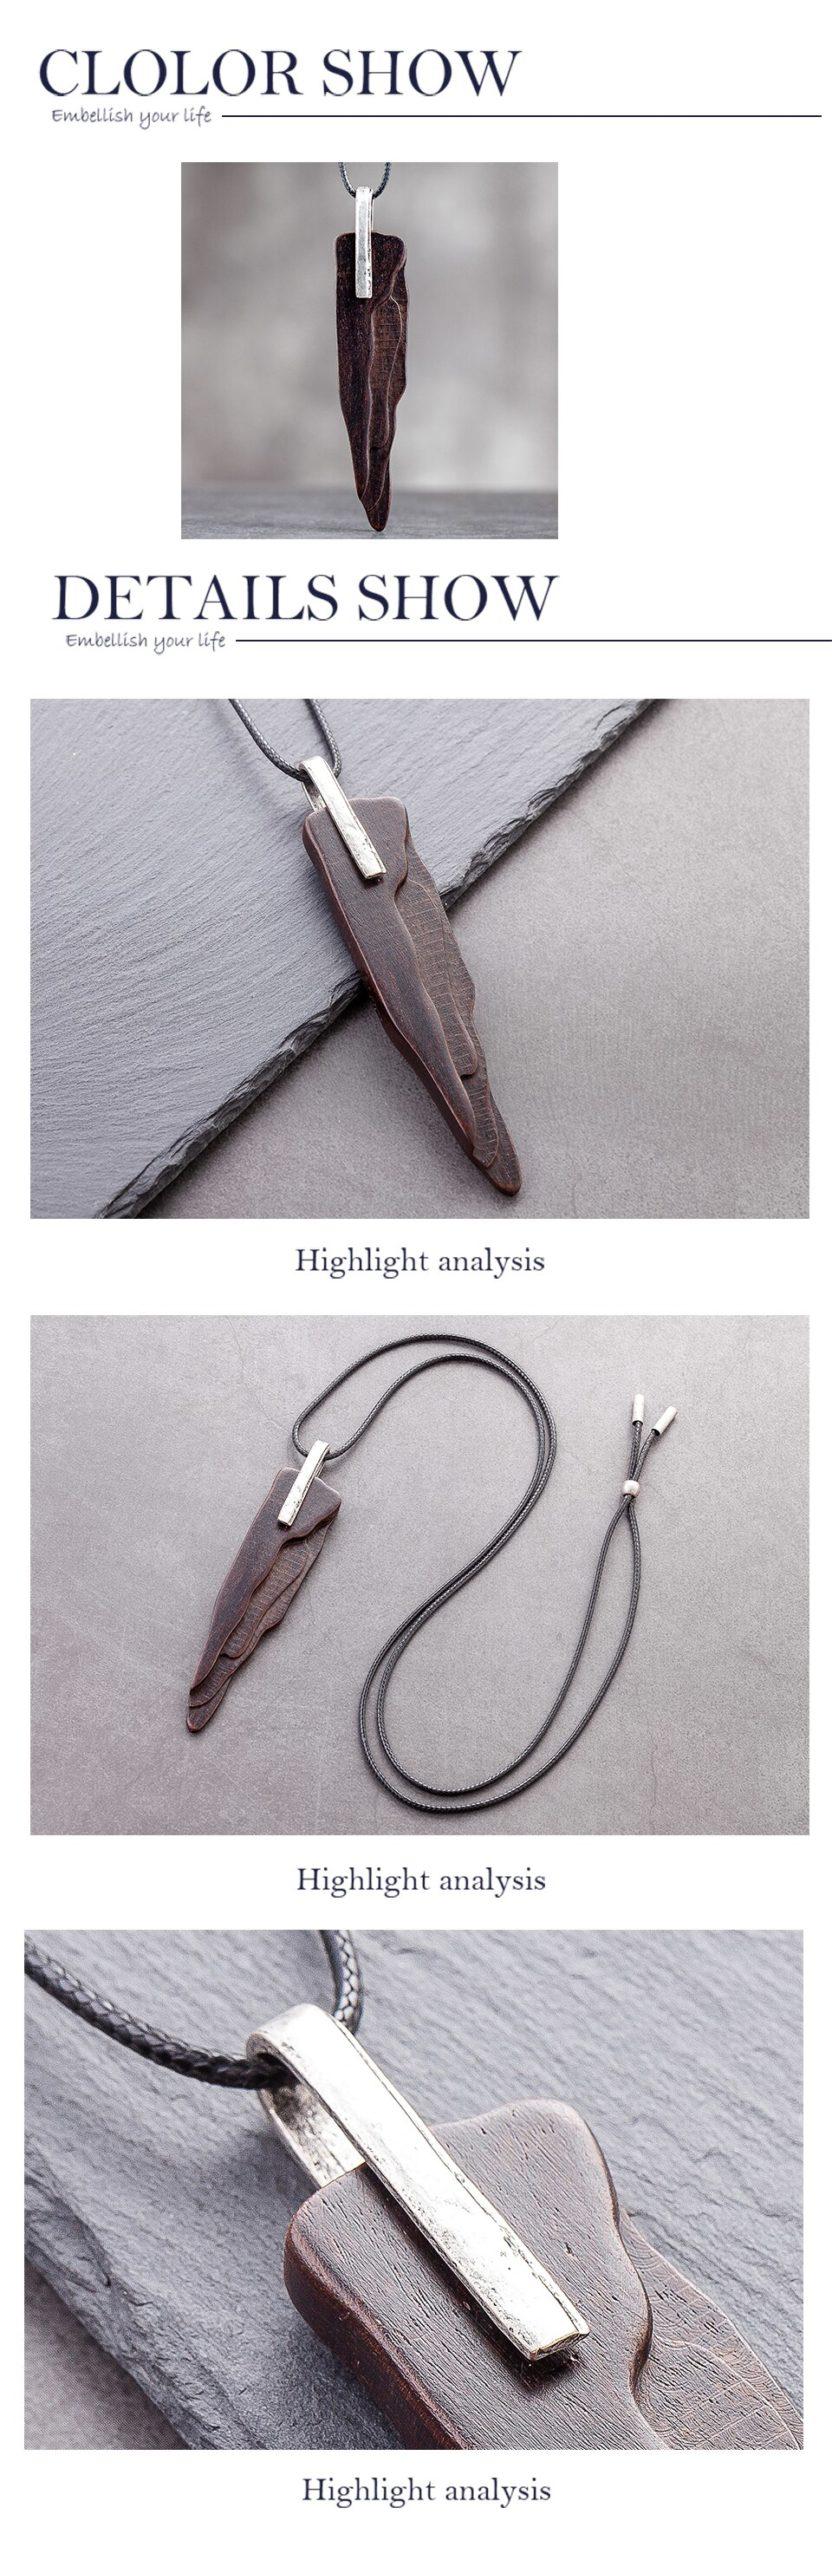 Handmade Sandalwood Fashion Jewelry Collar Neck Chocker Accessories Cute Jewlery Long Pendant Necklace Christmas Gifts for Women